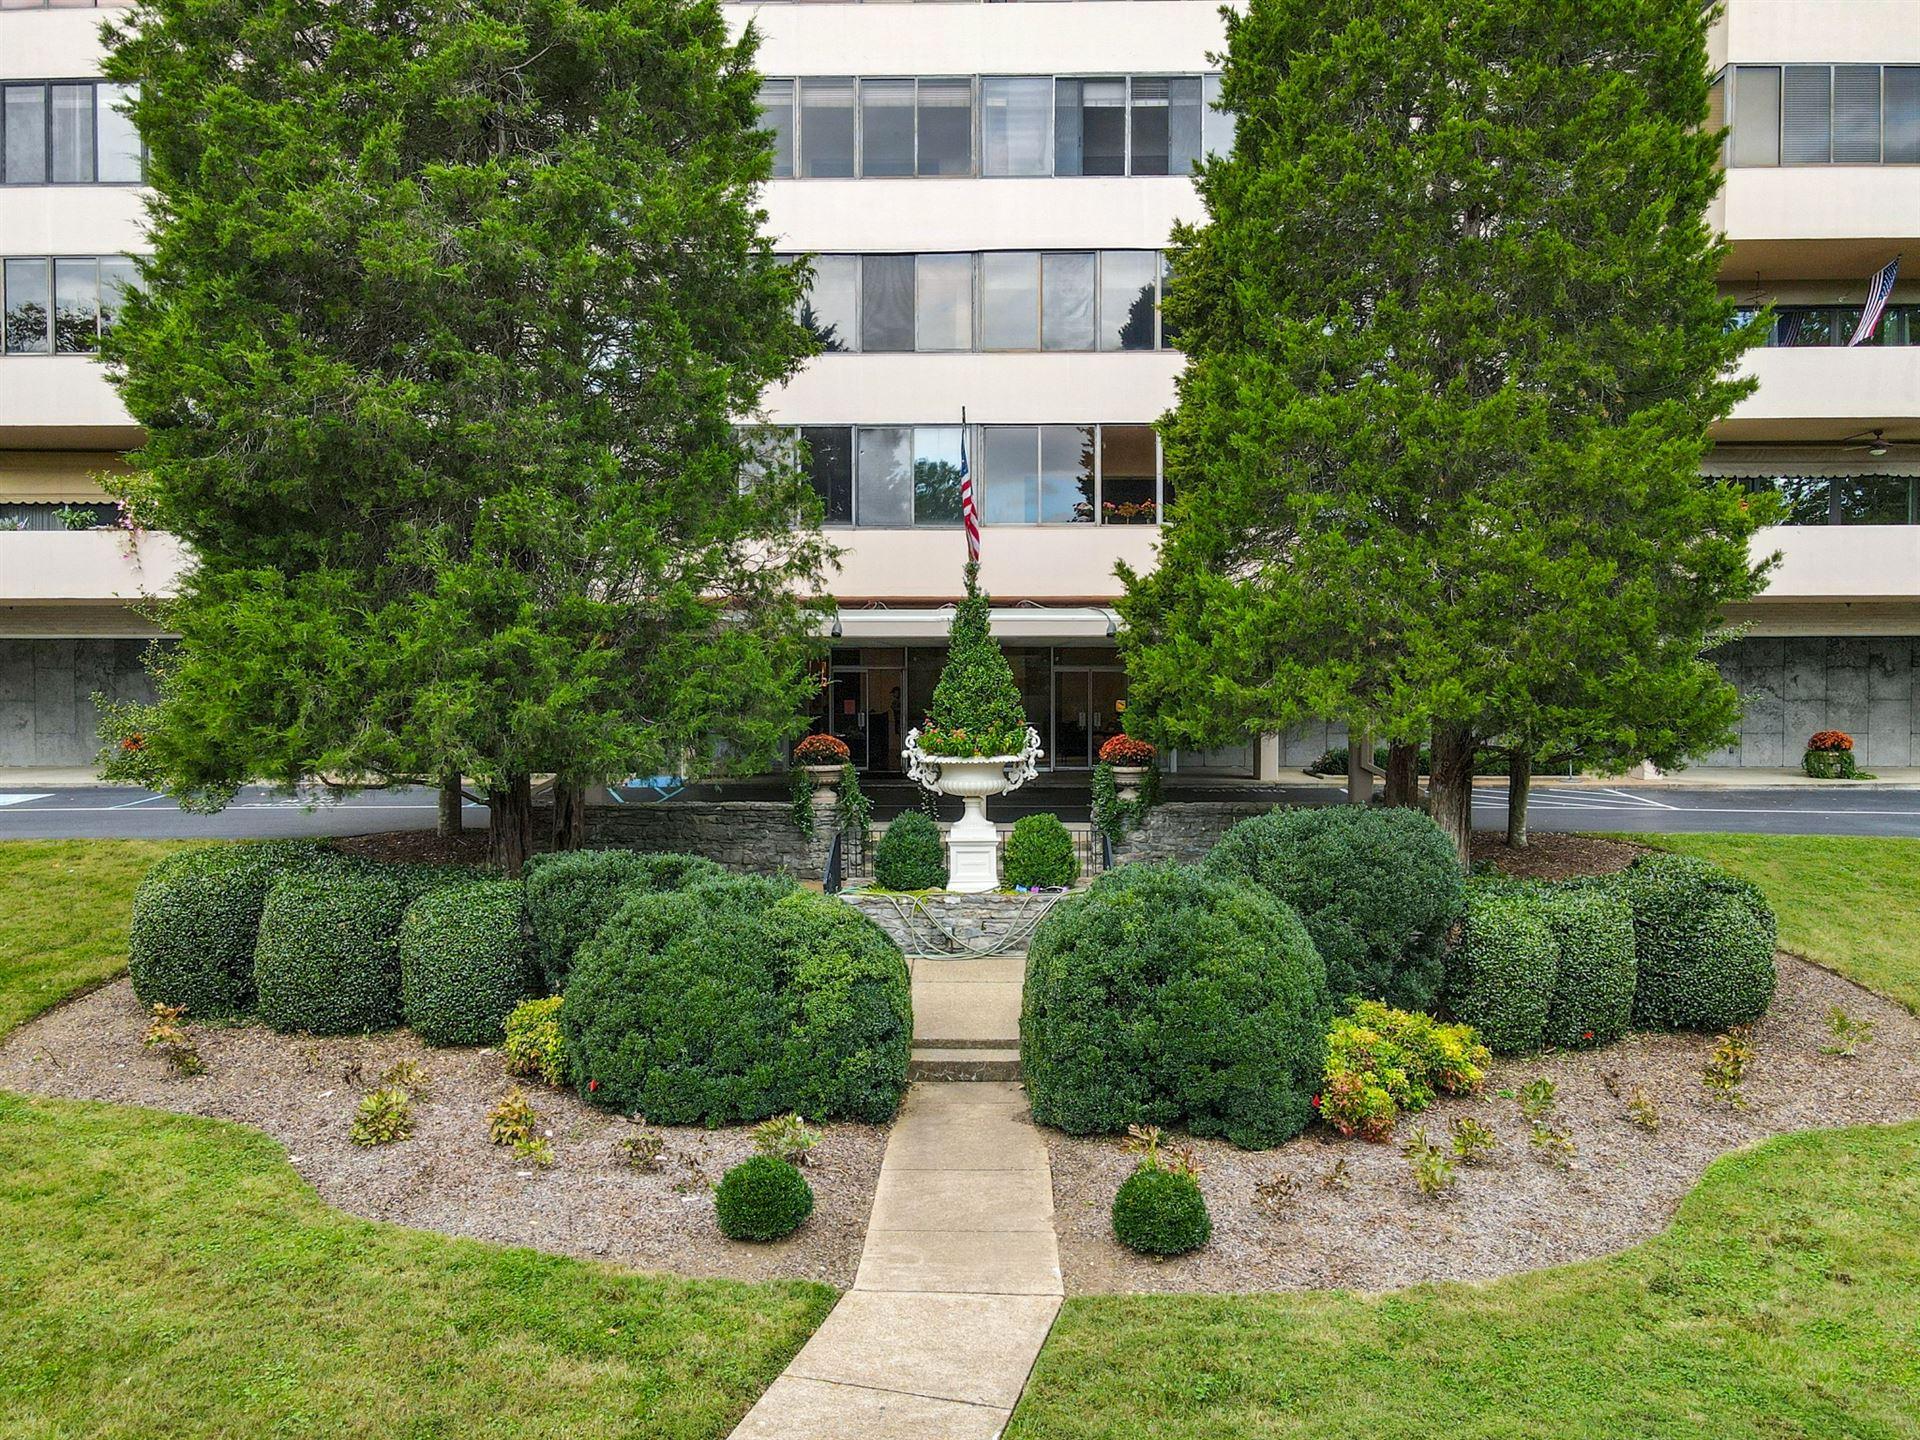 Photo of 105 Leake Ave #40, Nashville, TN 37205 (MLS # 2200167)